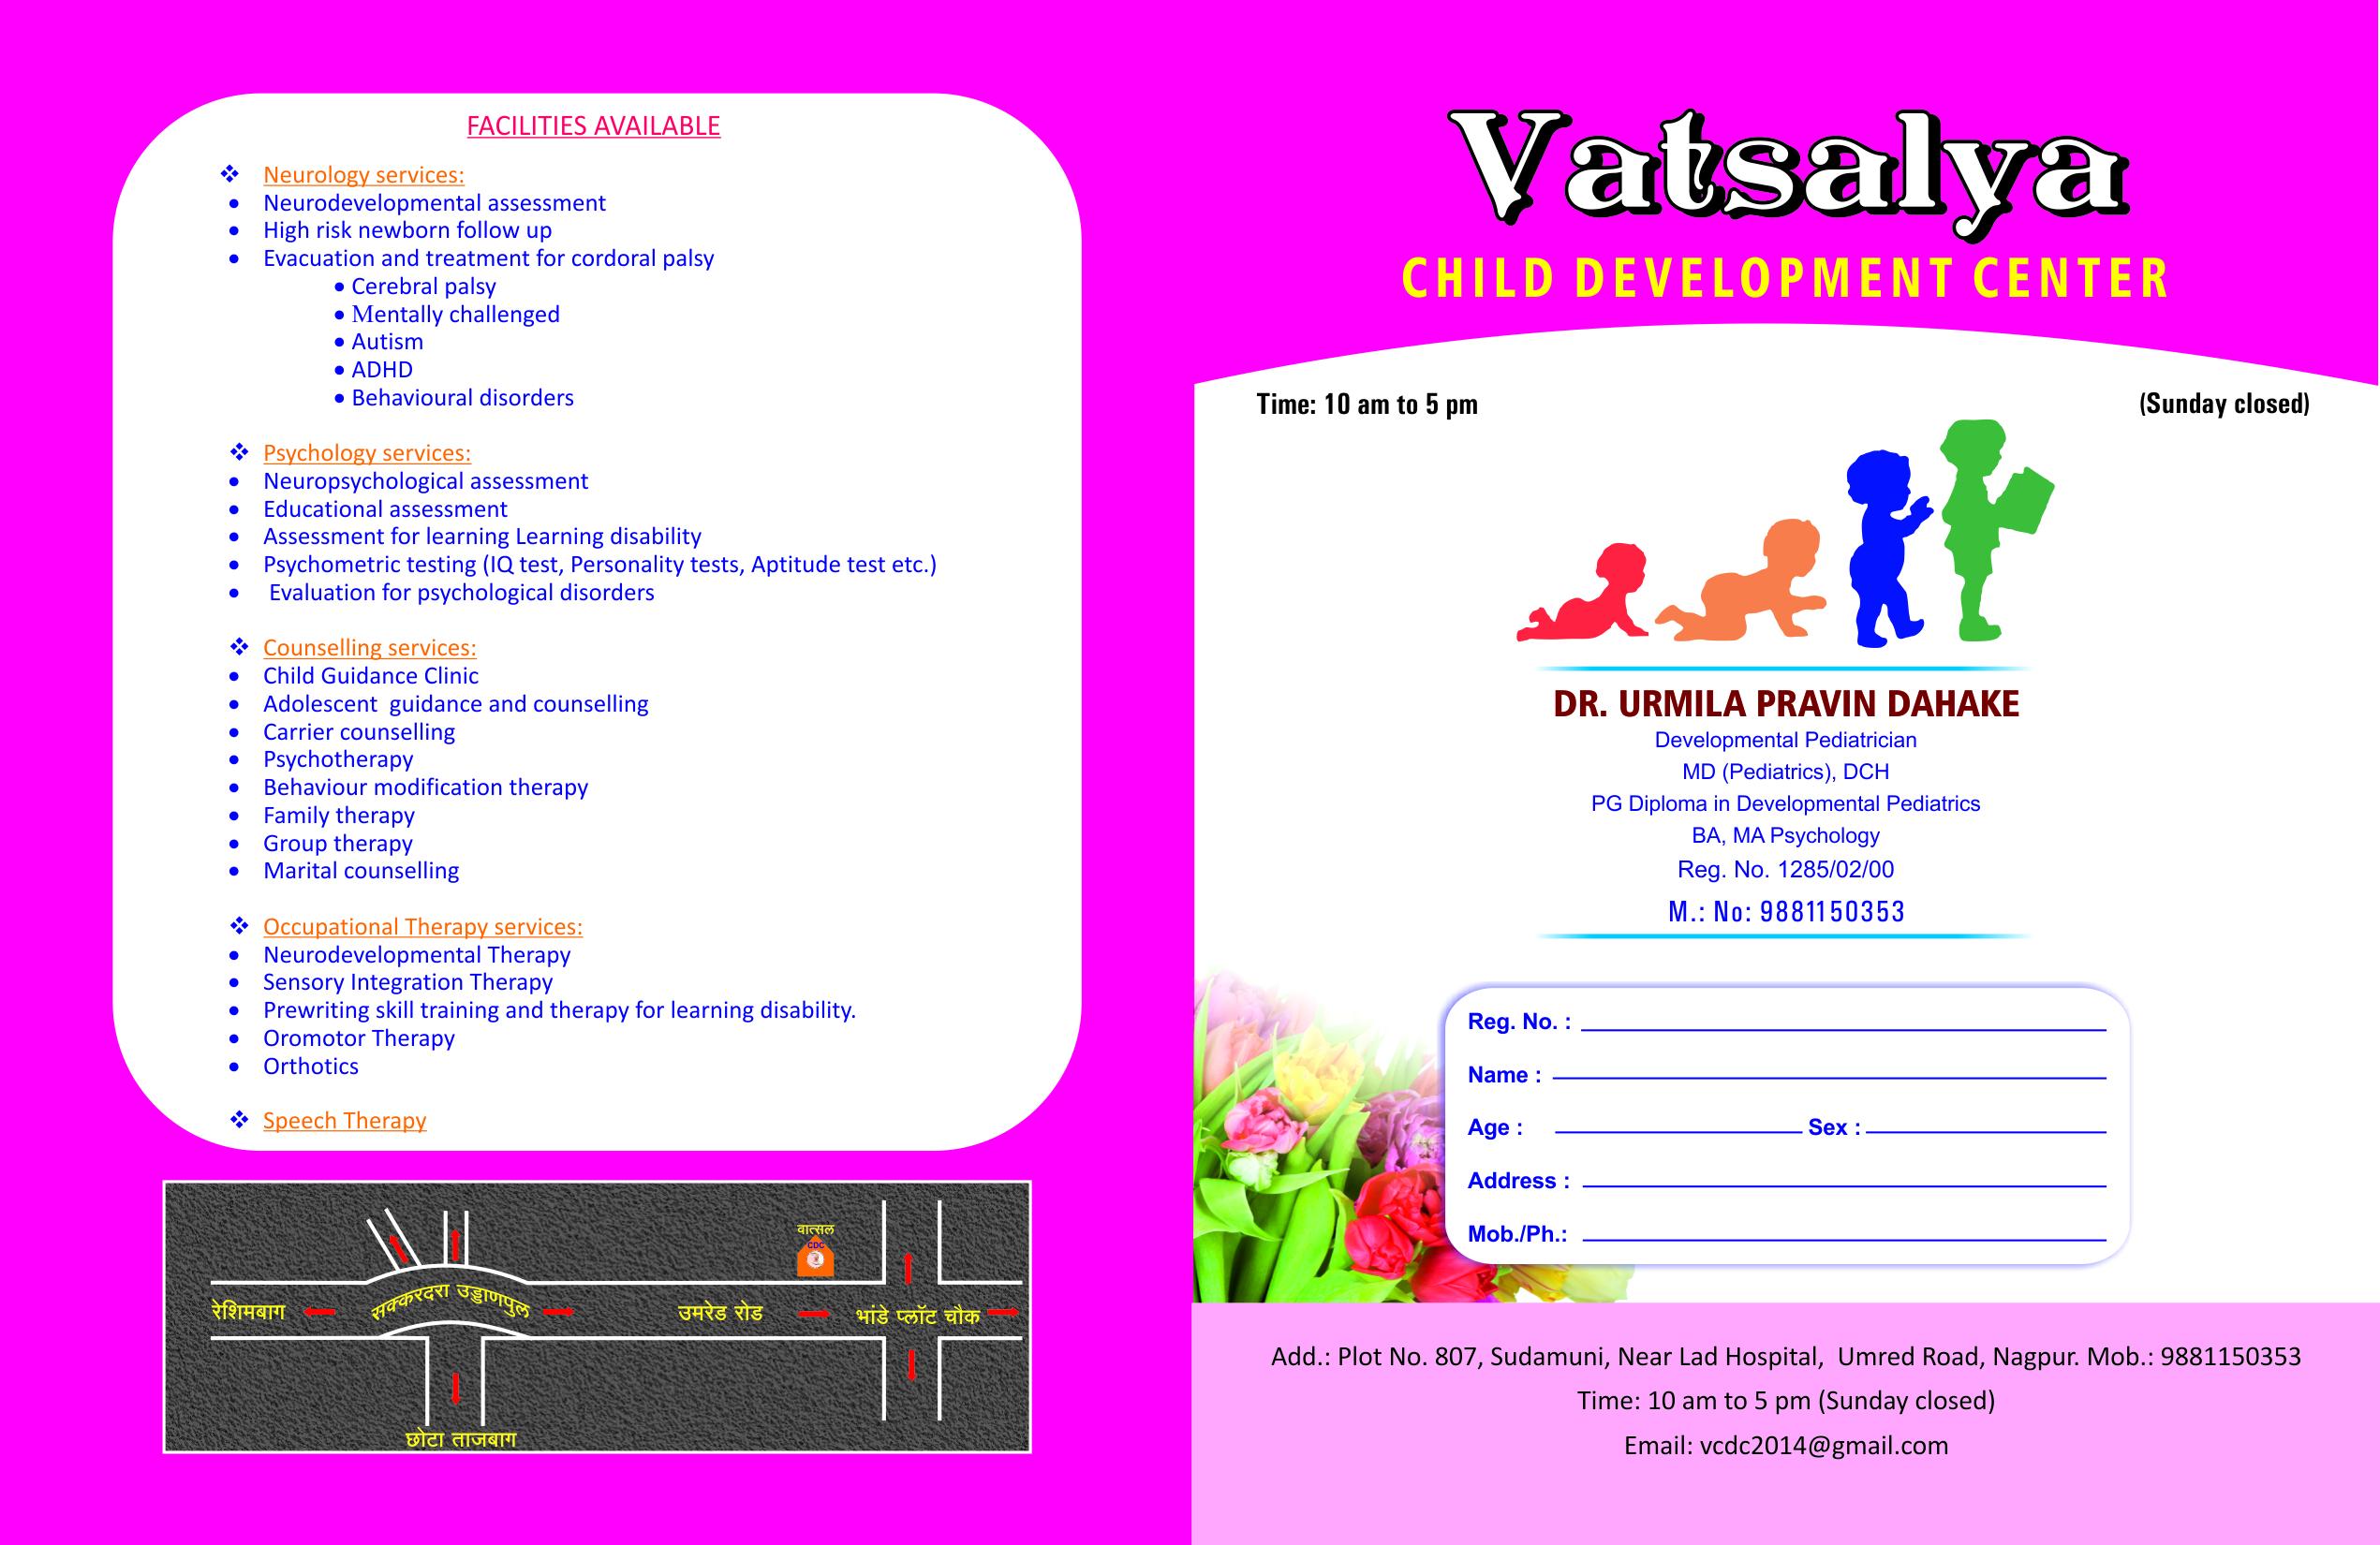 Vatsalya Child Development Center